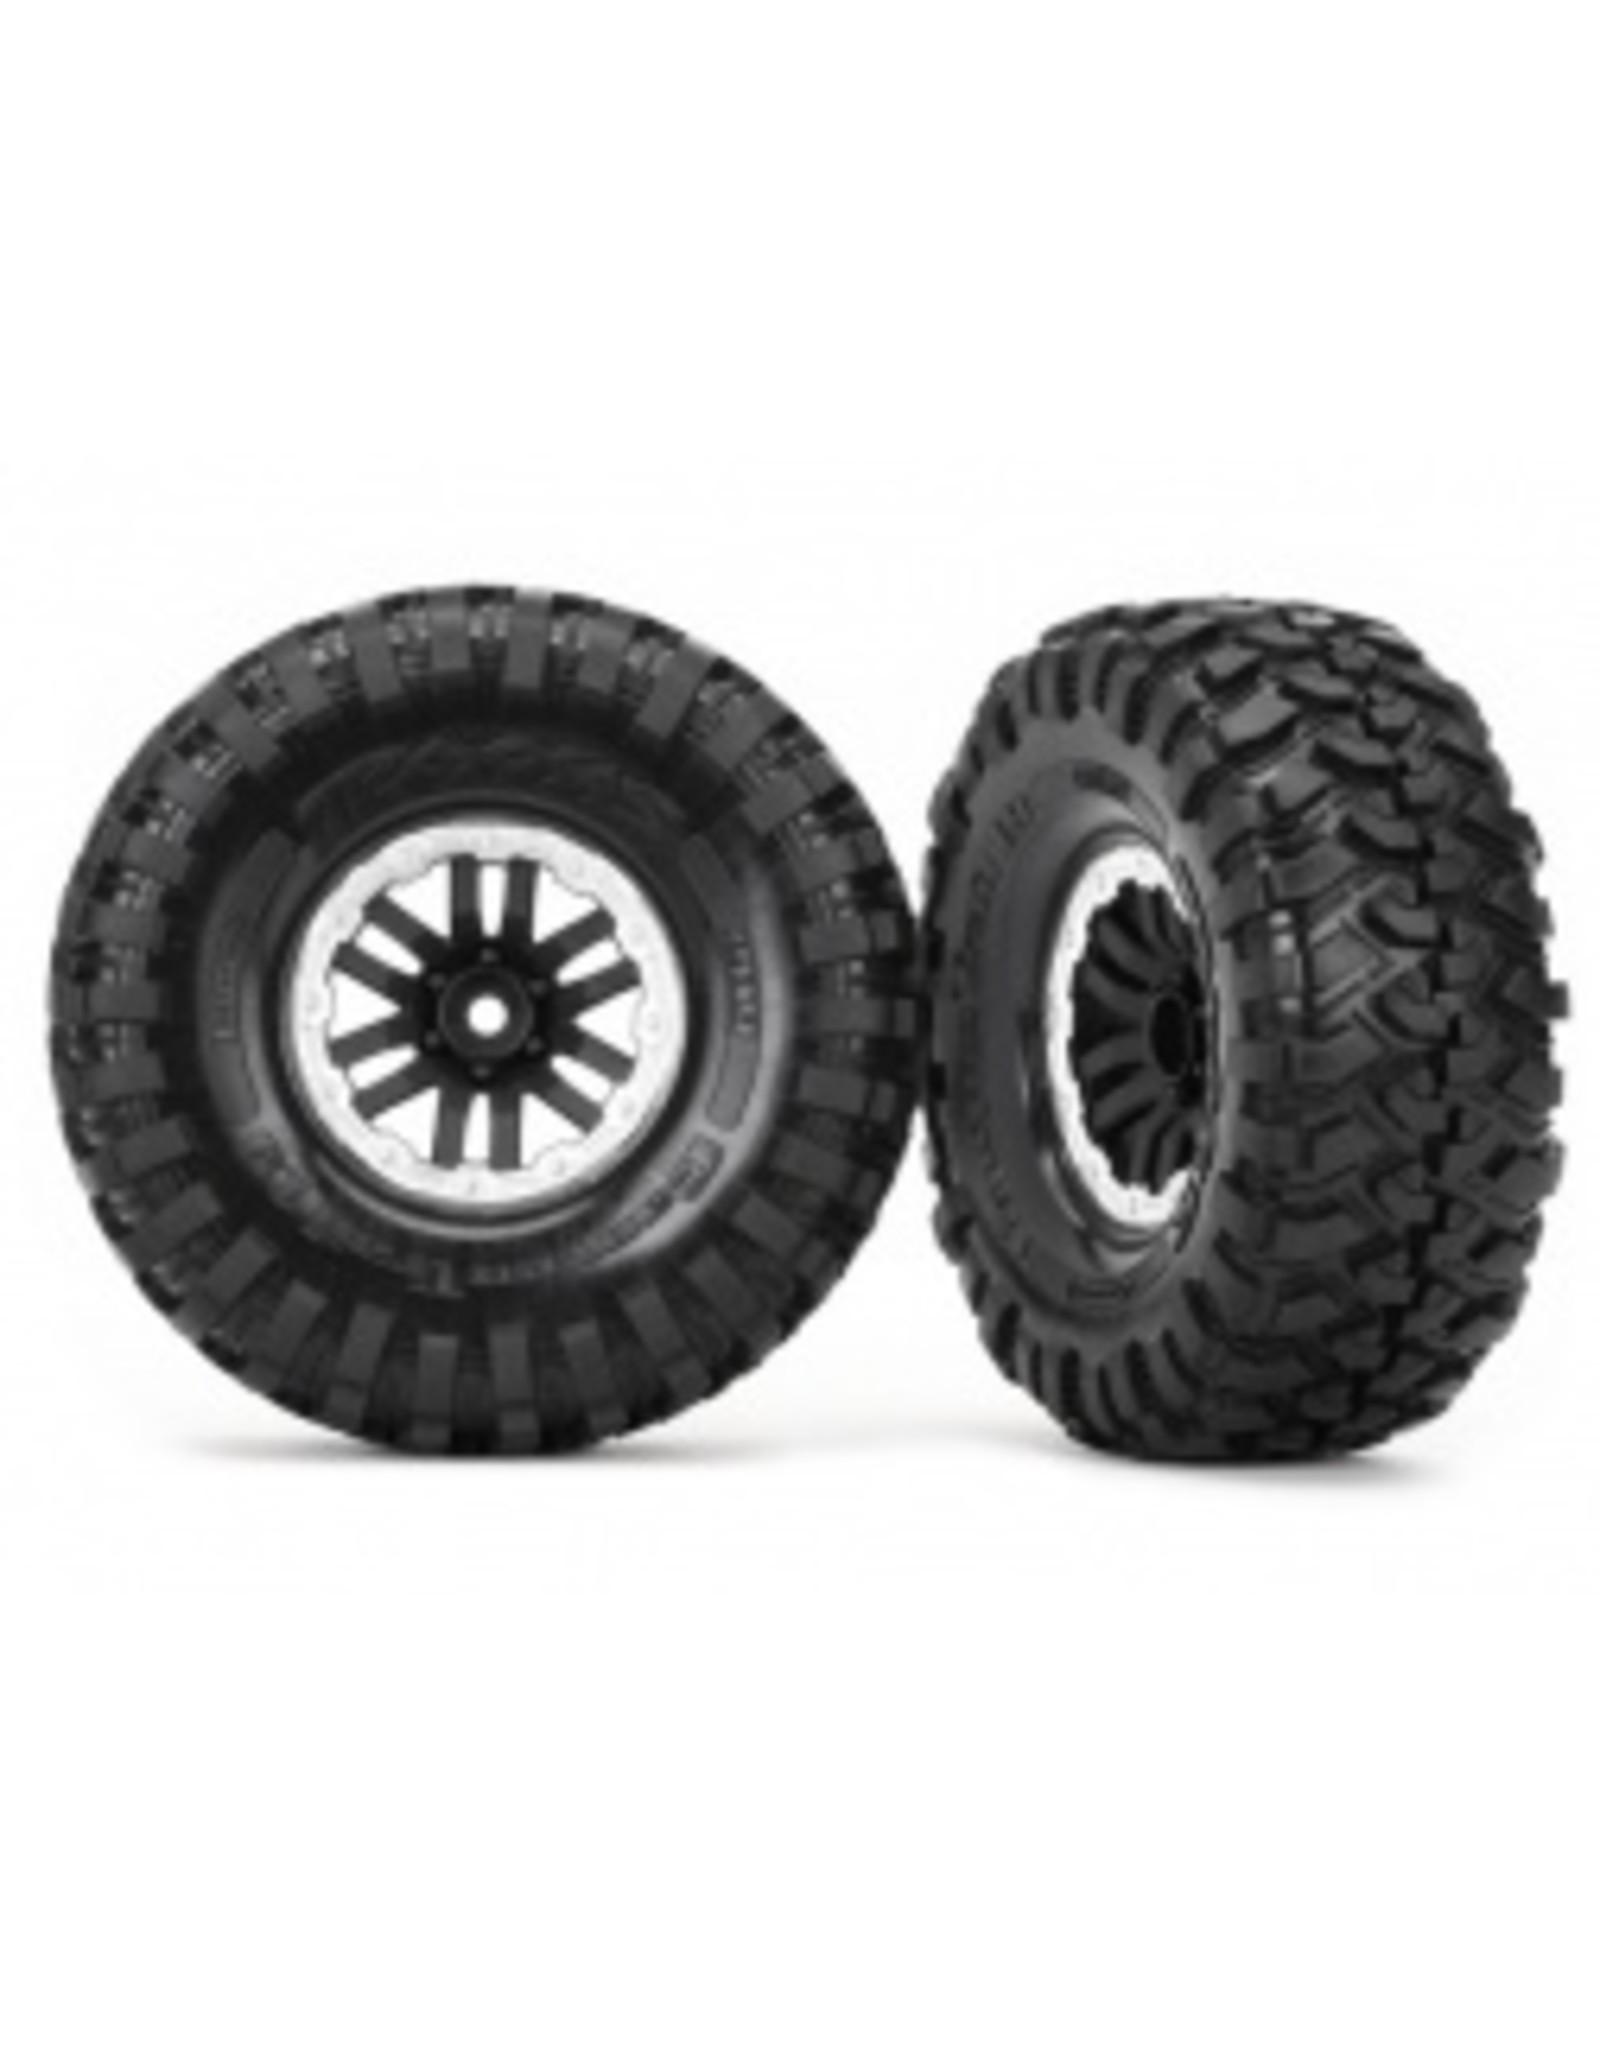 Traxxas Tires and wheels, assembled, glued (TRX-4 satin beadlock wheels, Canyon Trail 1.9 tires) (2)(8272x)